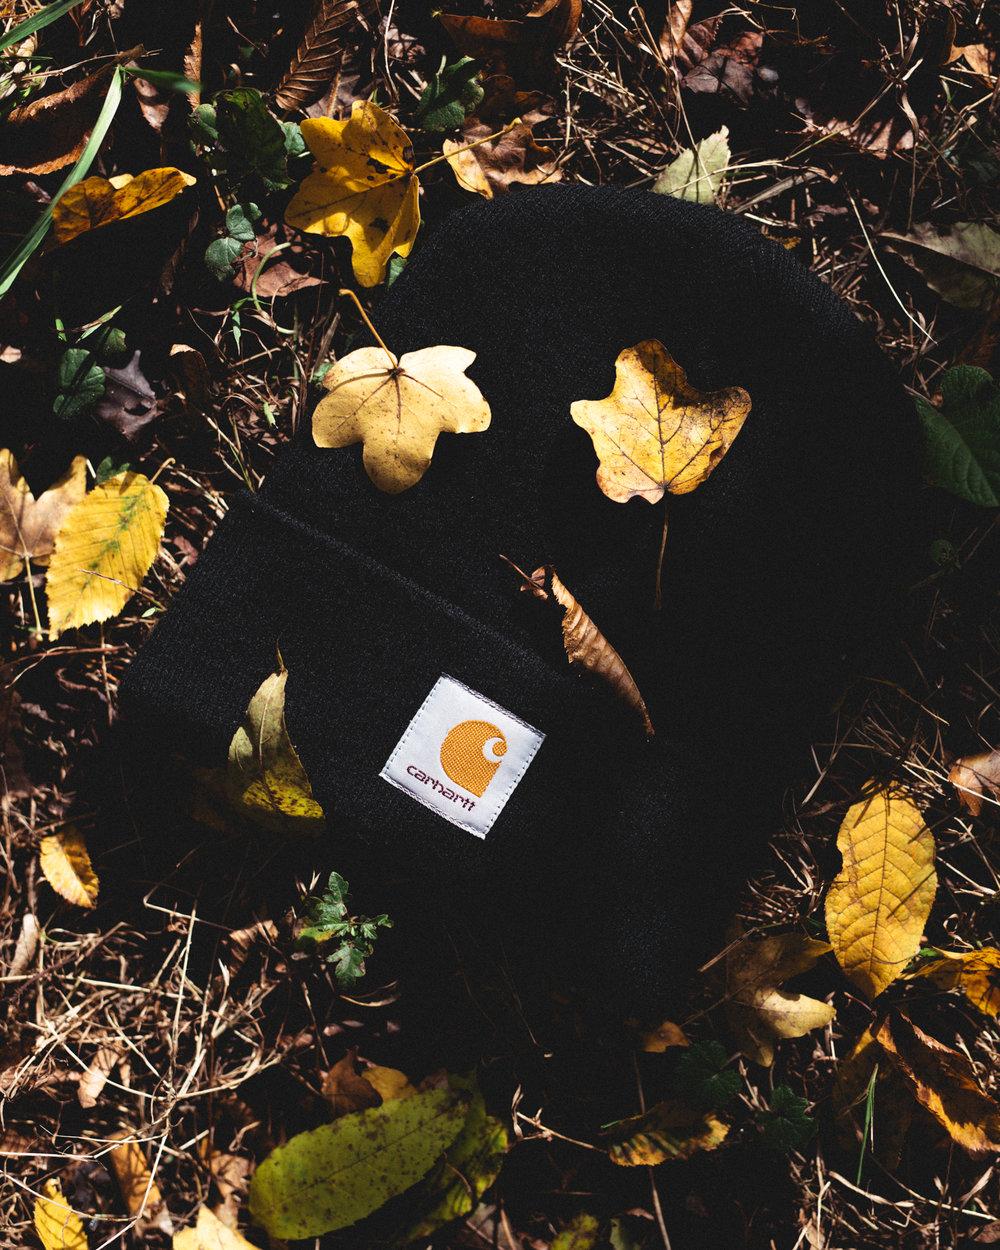 WasDrew_Autumn_Vibes_008.jpg